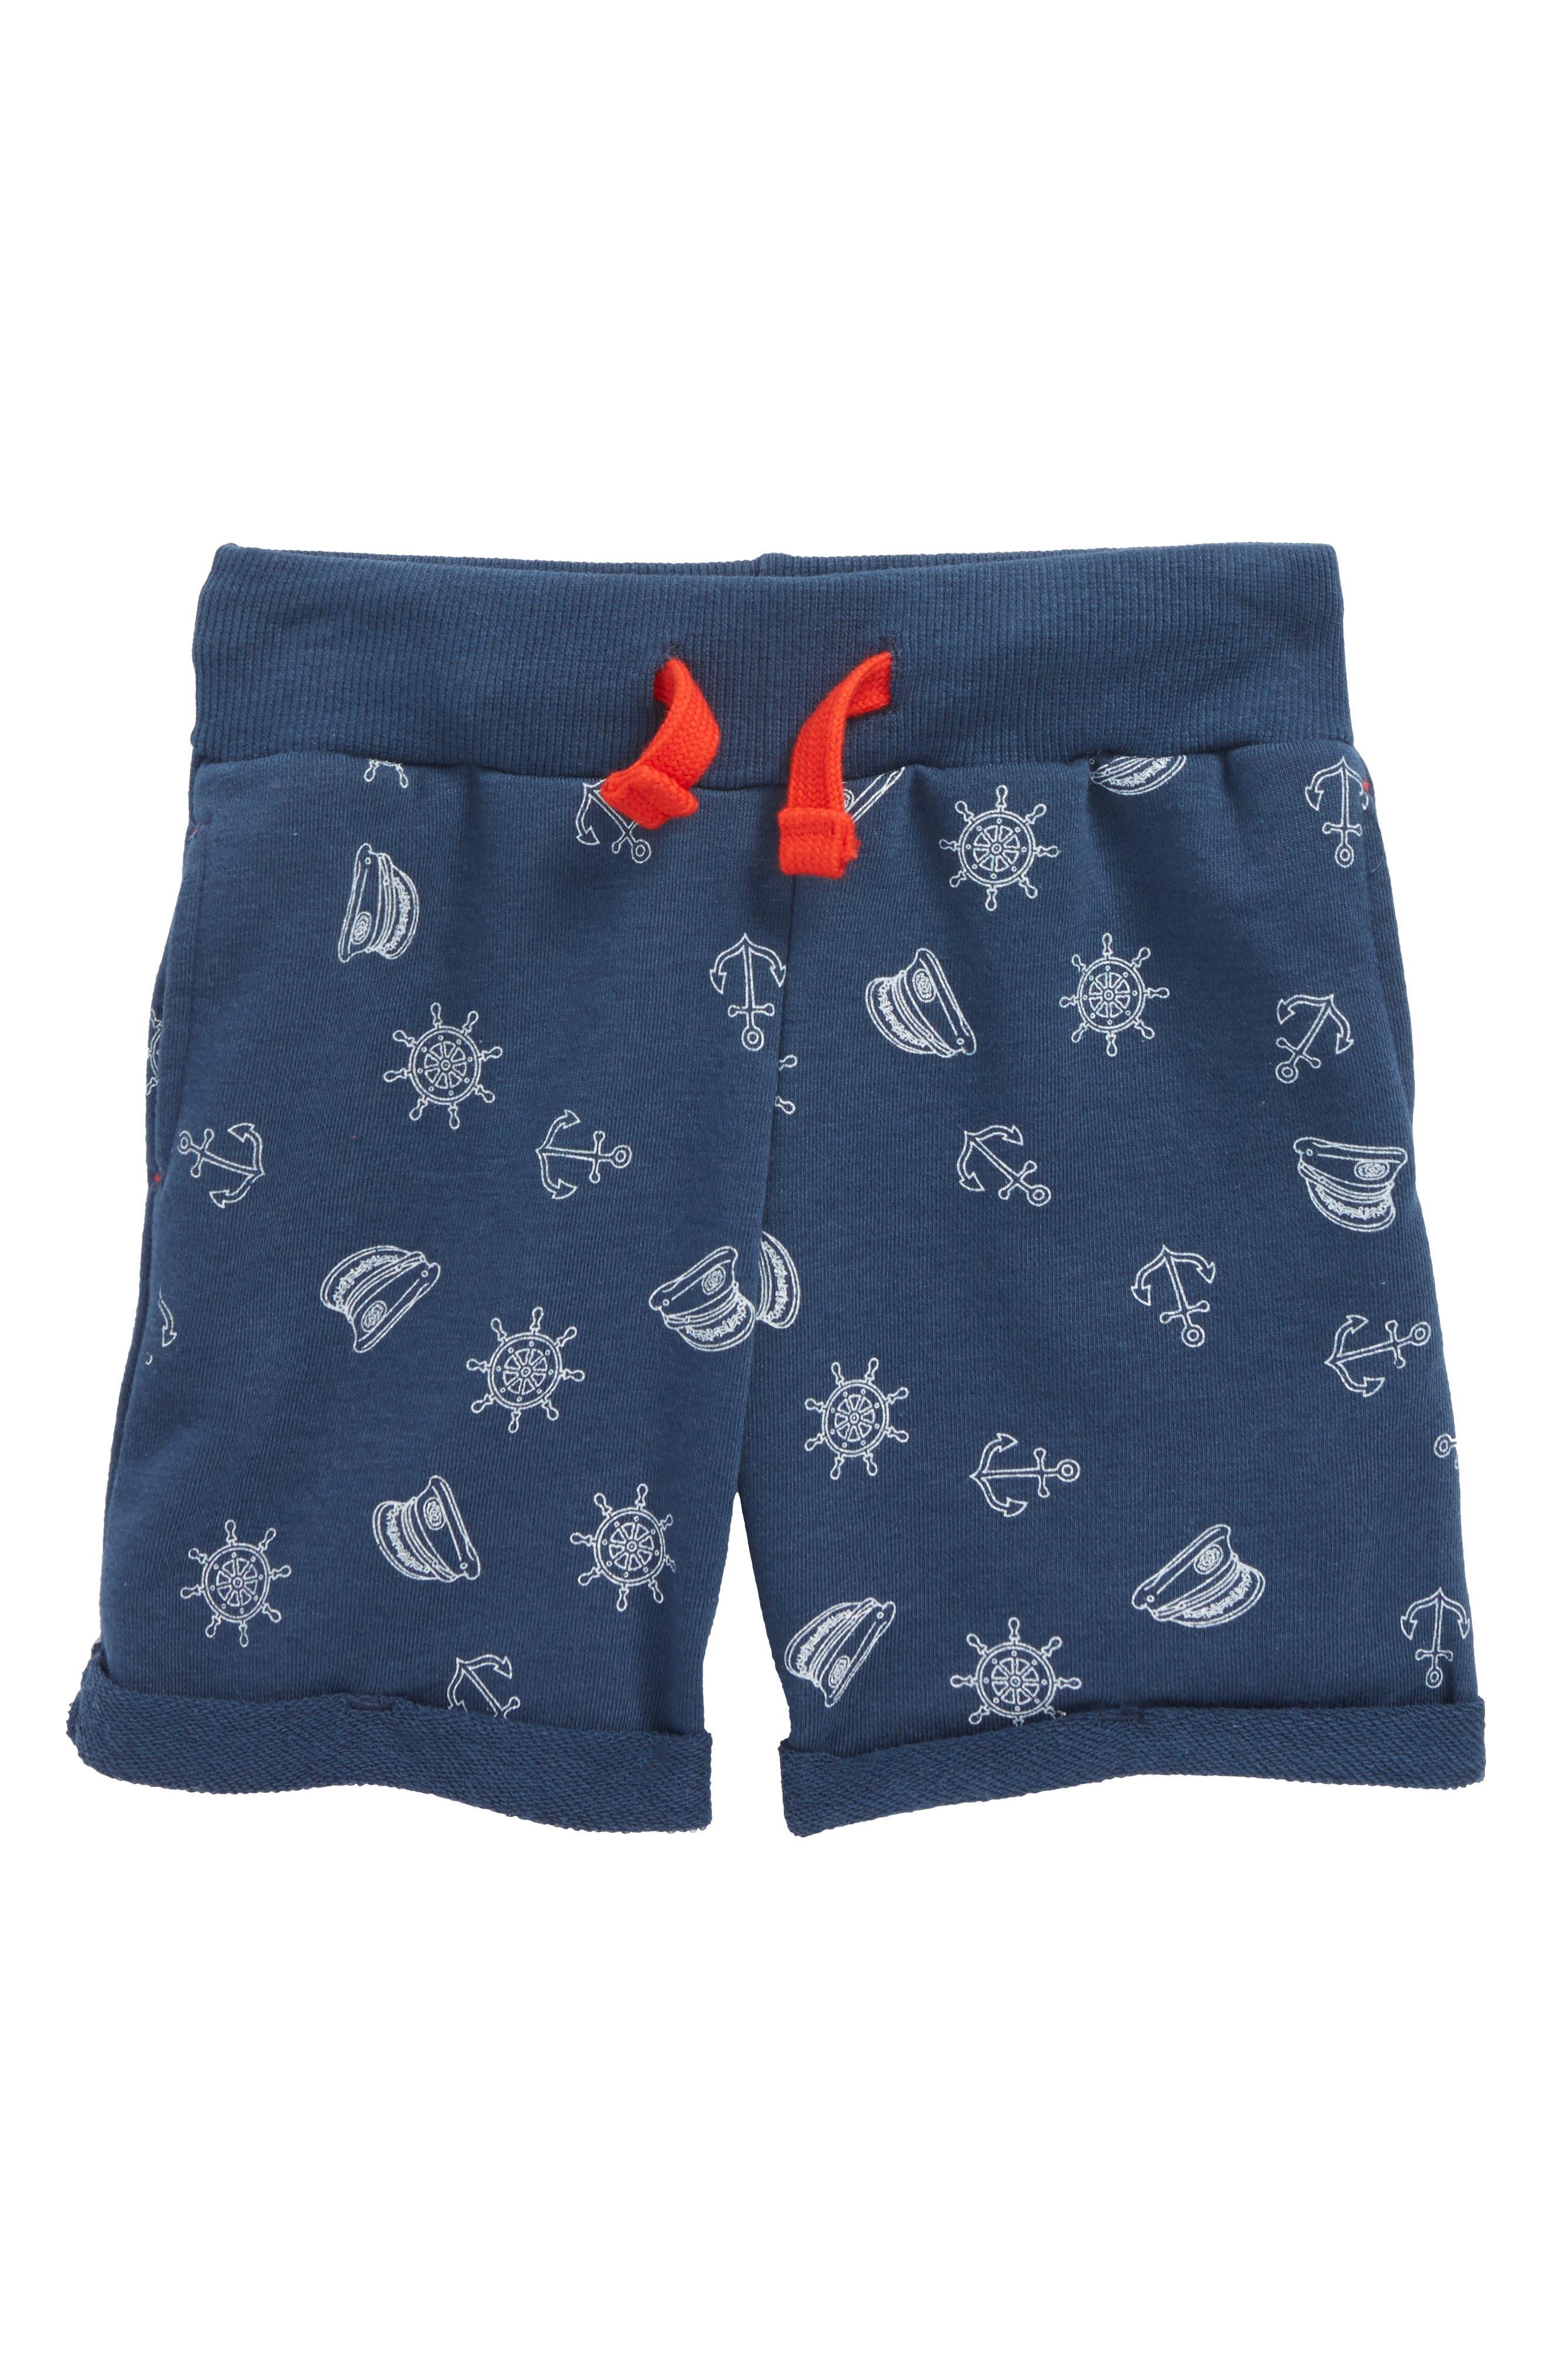 Sovereign Code Captain Adriel Knit Shorts (Toddler Boys & Little Boys)